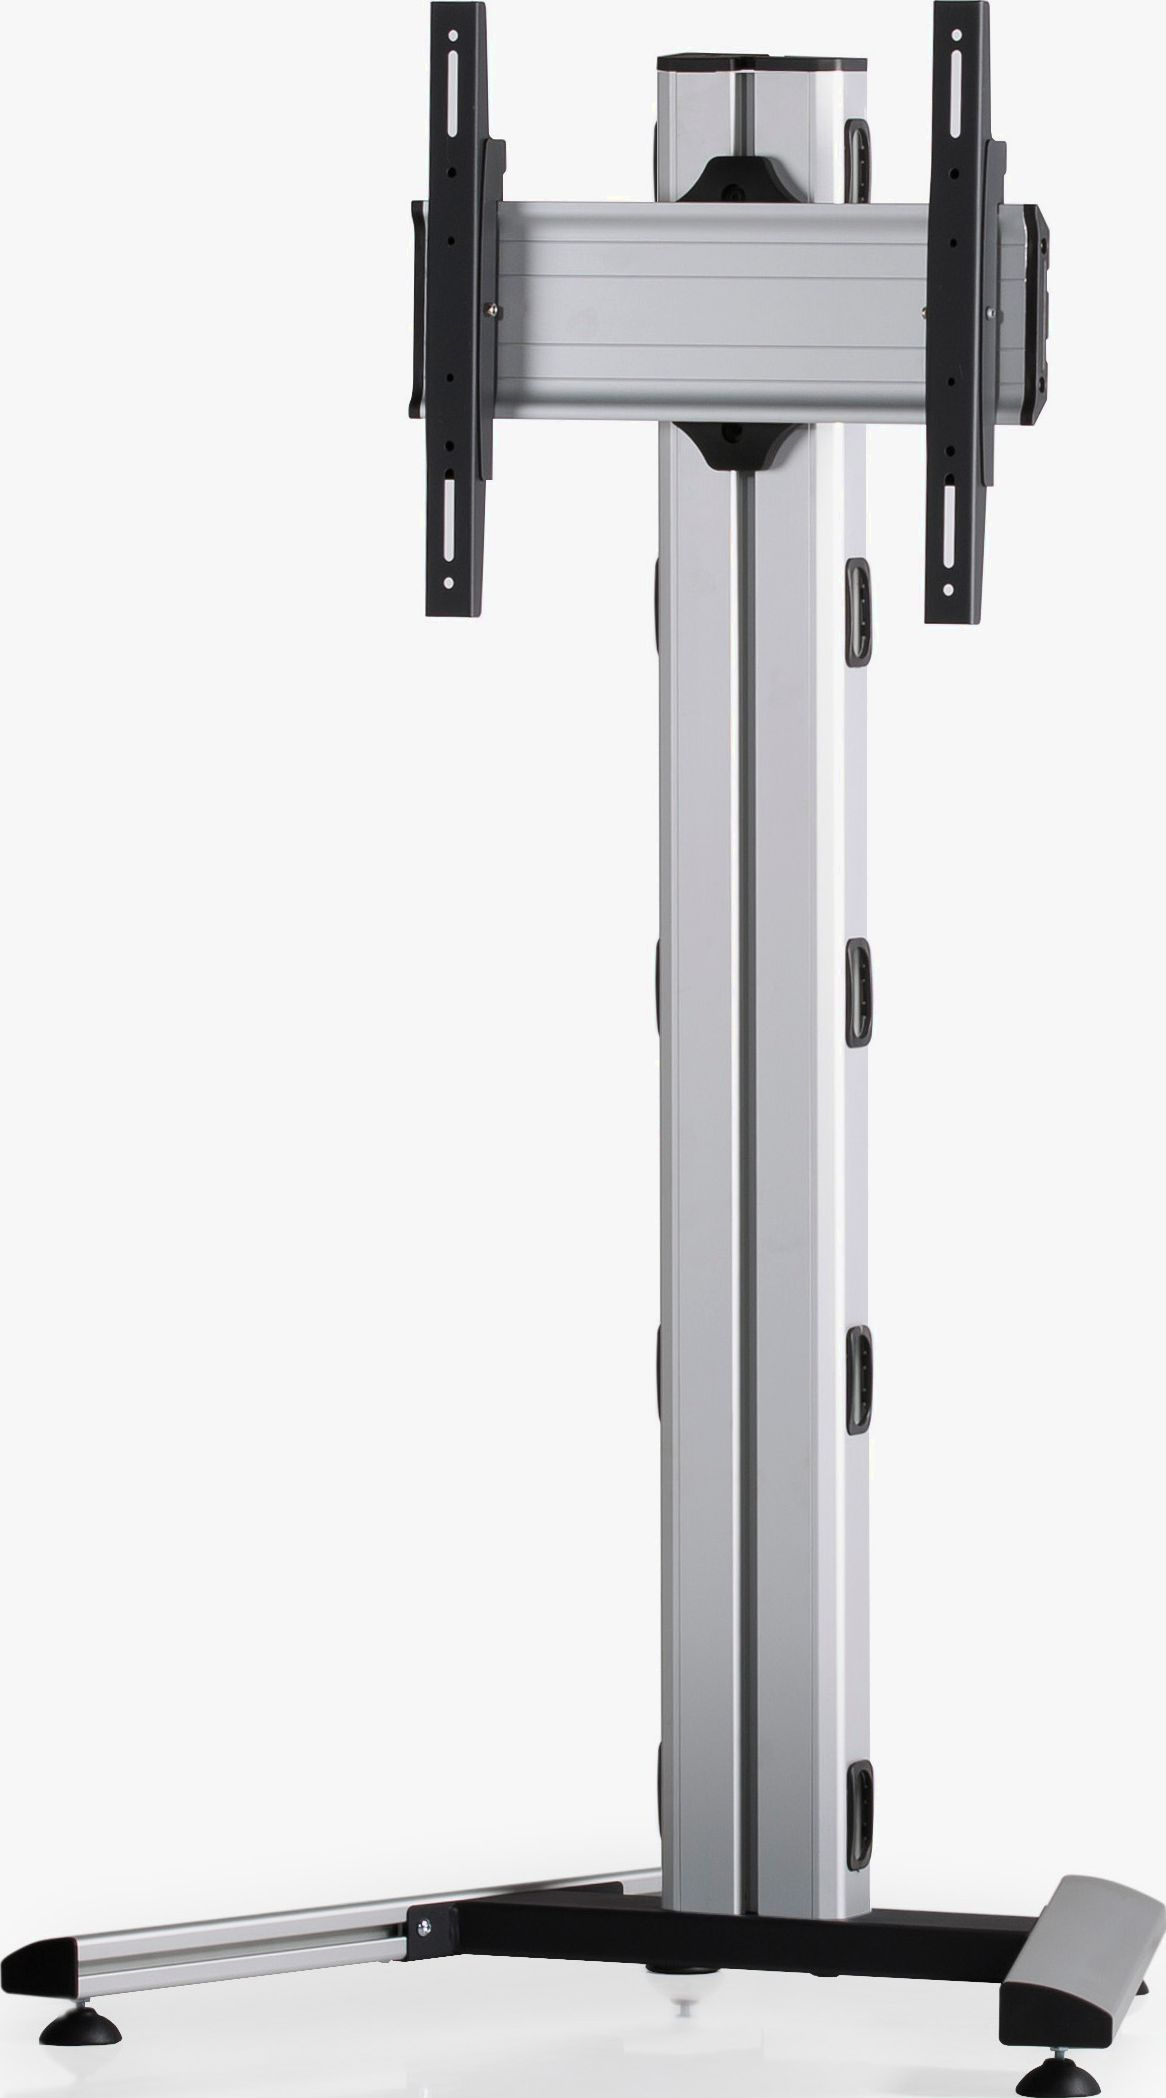 1 Display 1×1, Höhe 135 cm, Standard-VESA, auf Standfuß